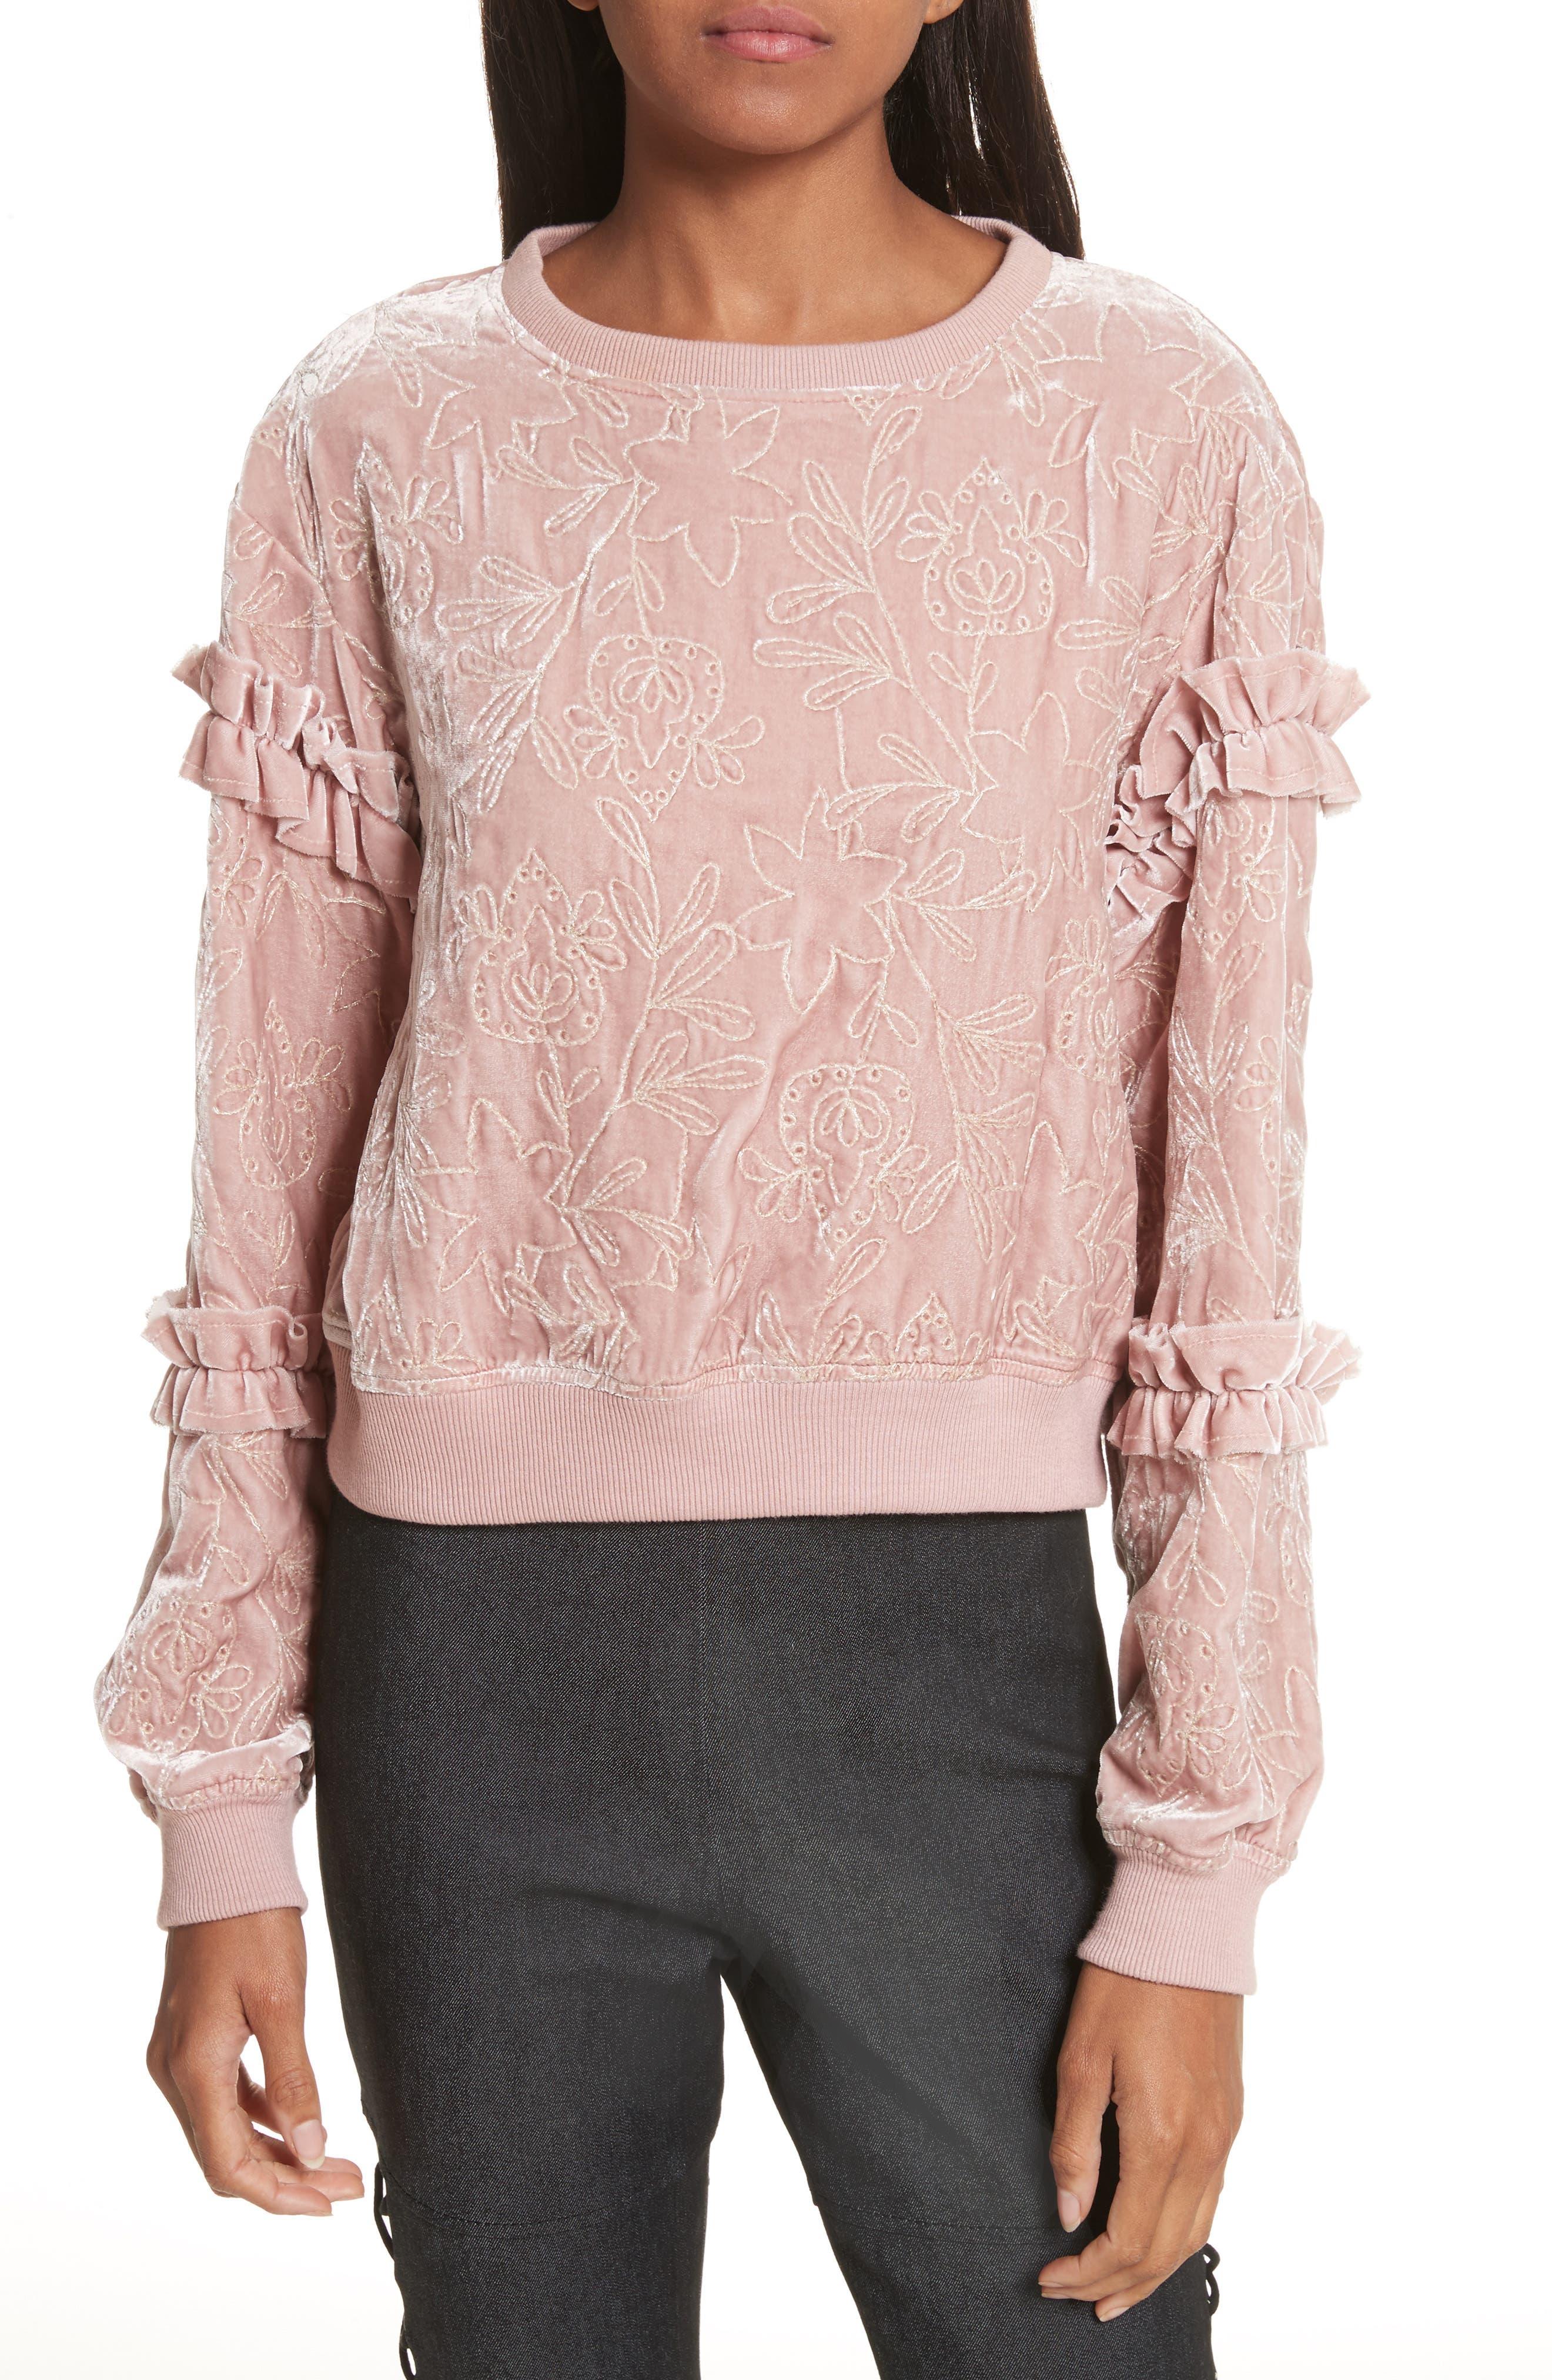 Nara Embroidered Velvet Sweatshirt,                         Main,                         color, Mauve